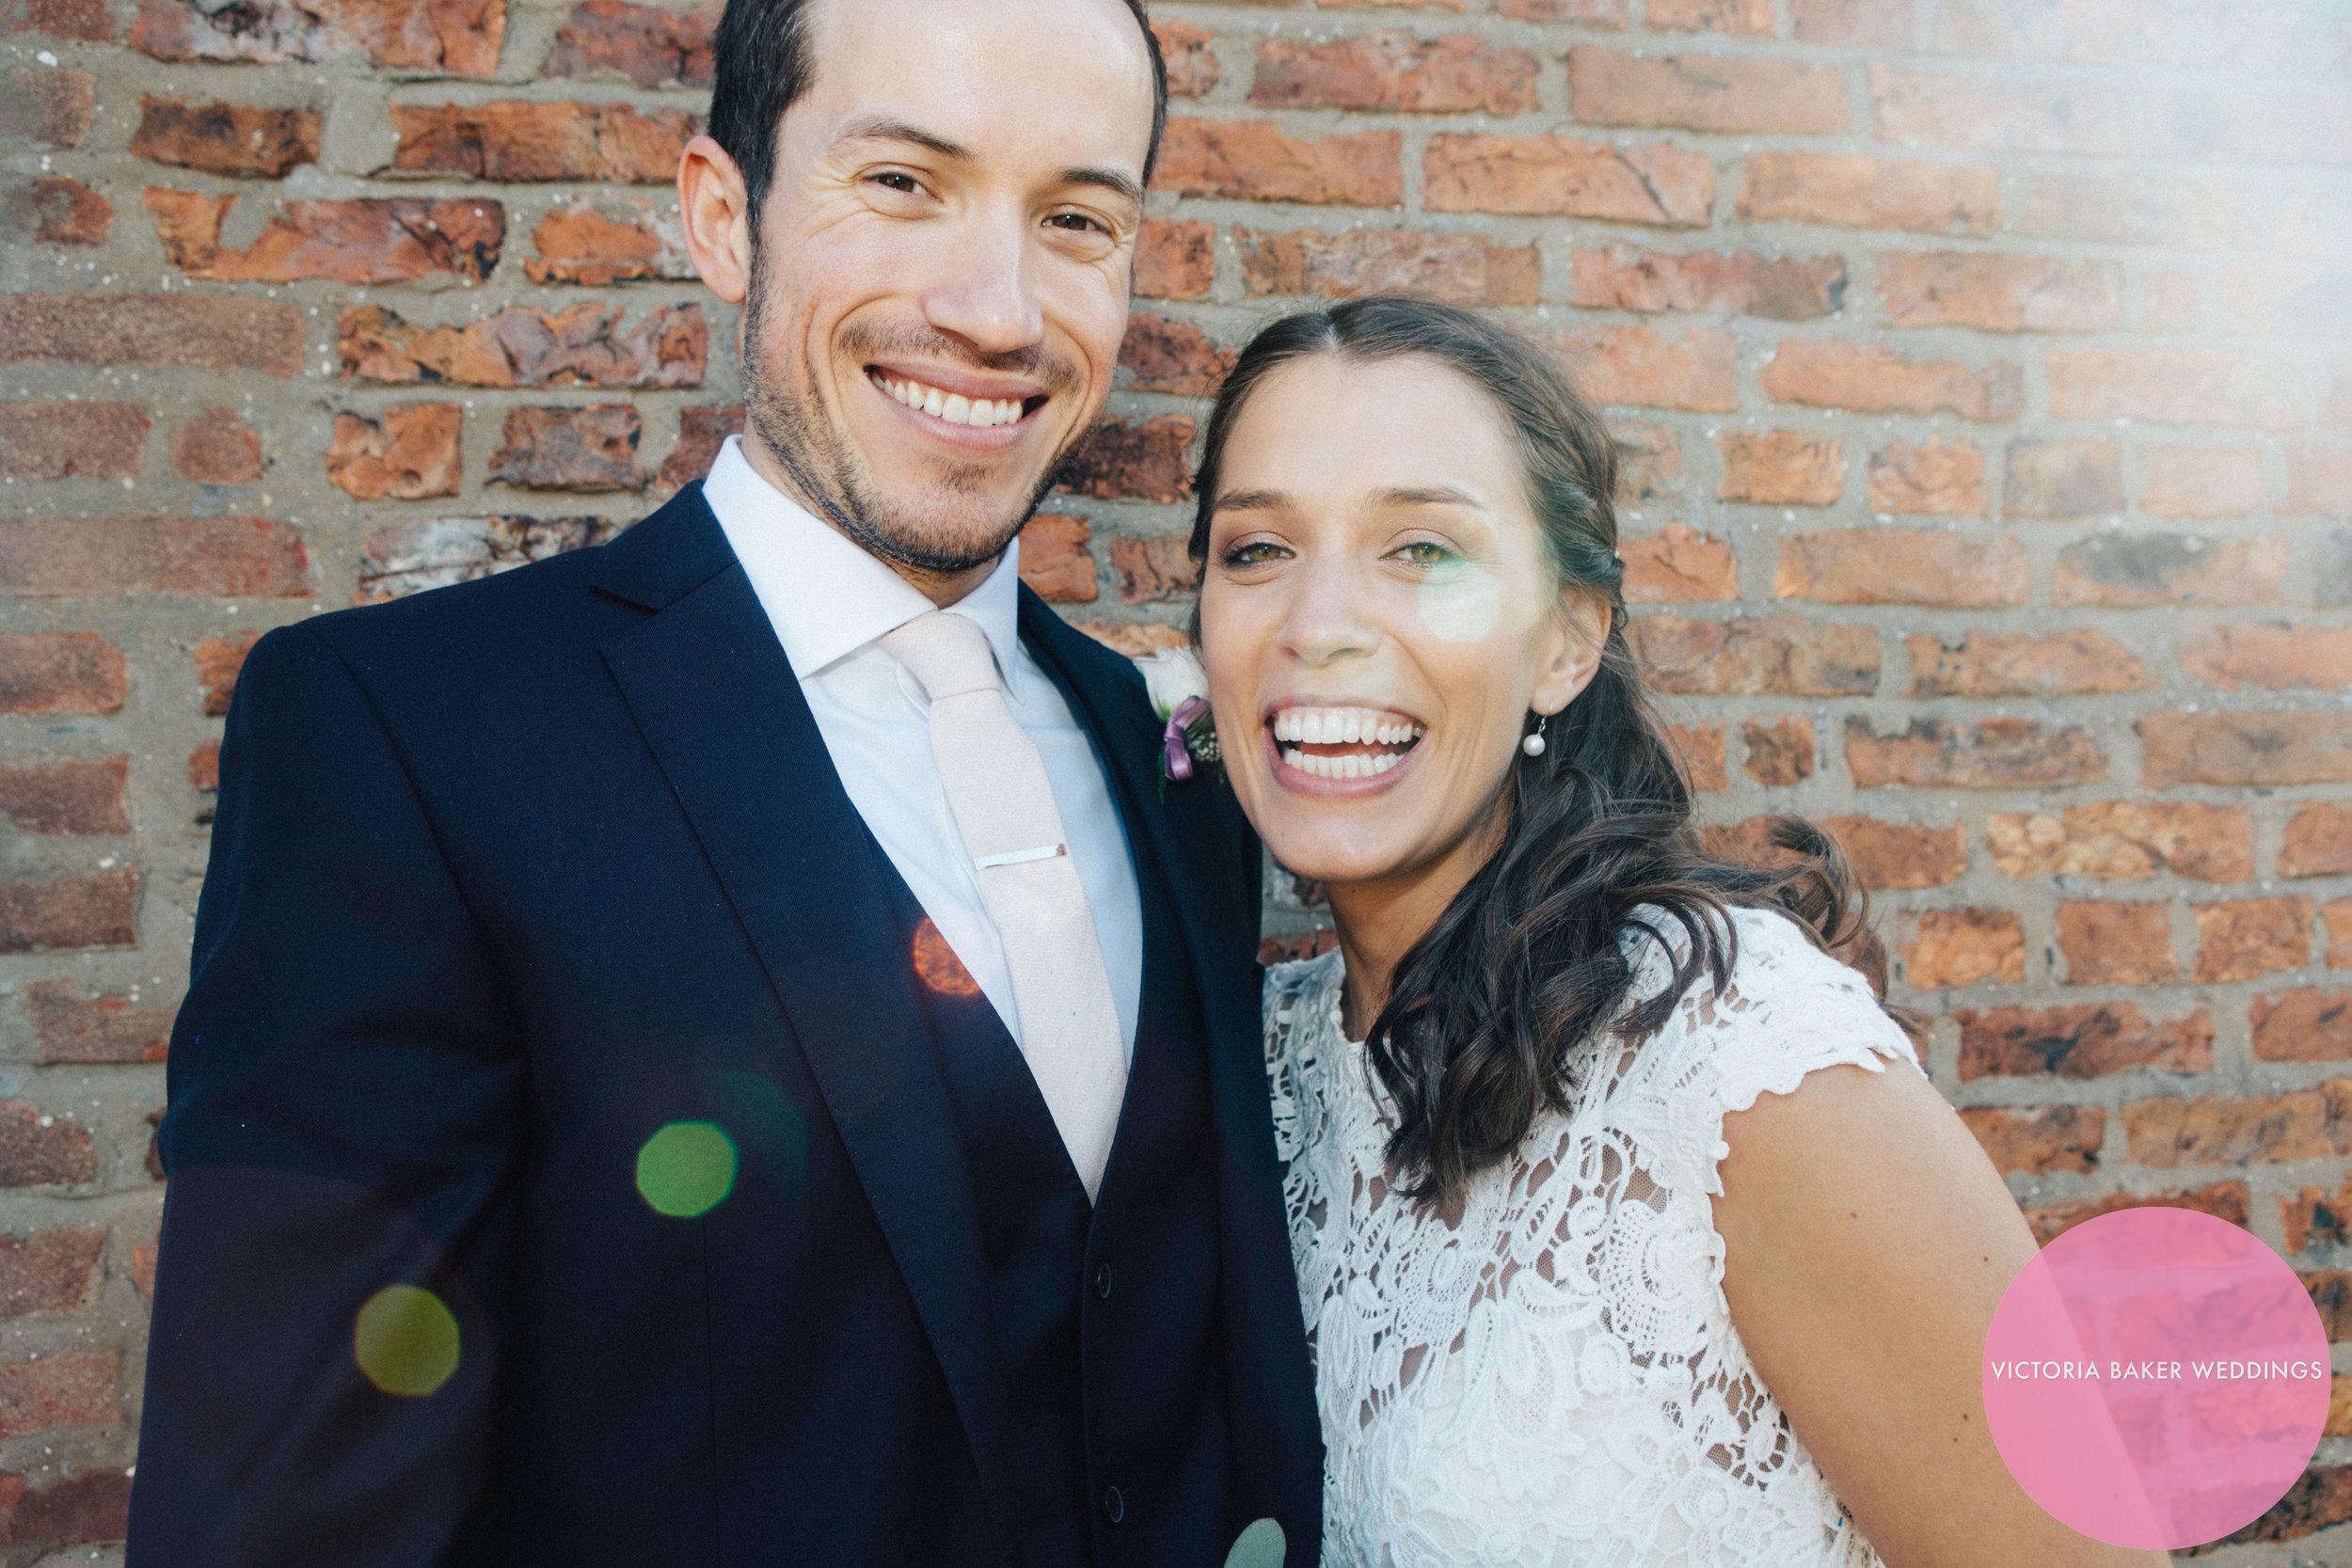 VictoriaBakerWeddings-Bride and Groom